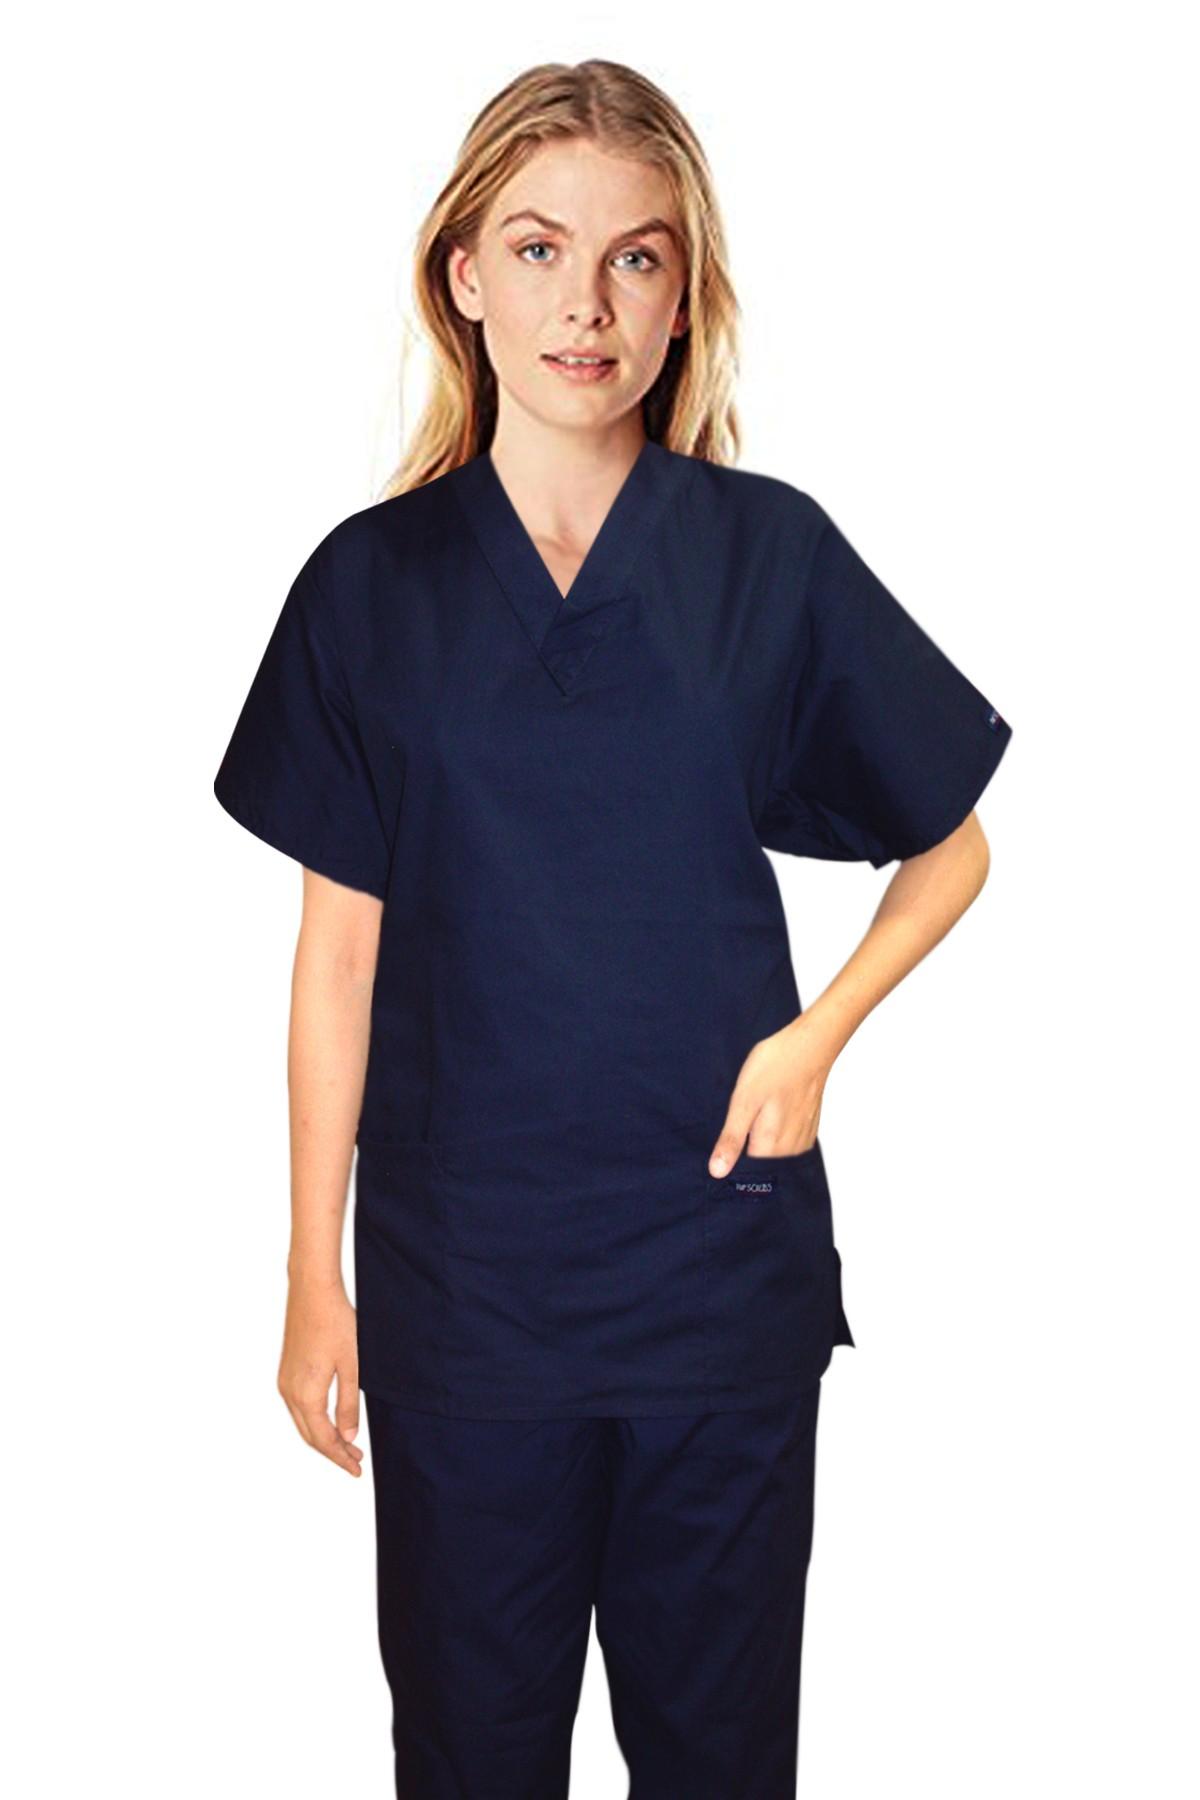 Stretchable Scrub set 3 pocket normal ladies solid half sleeve (2 pocket top 1 pocket pant) 97% Cotton 3% Spandex